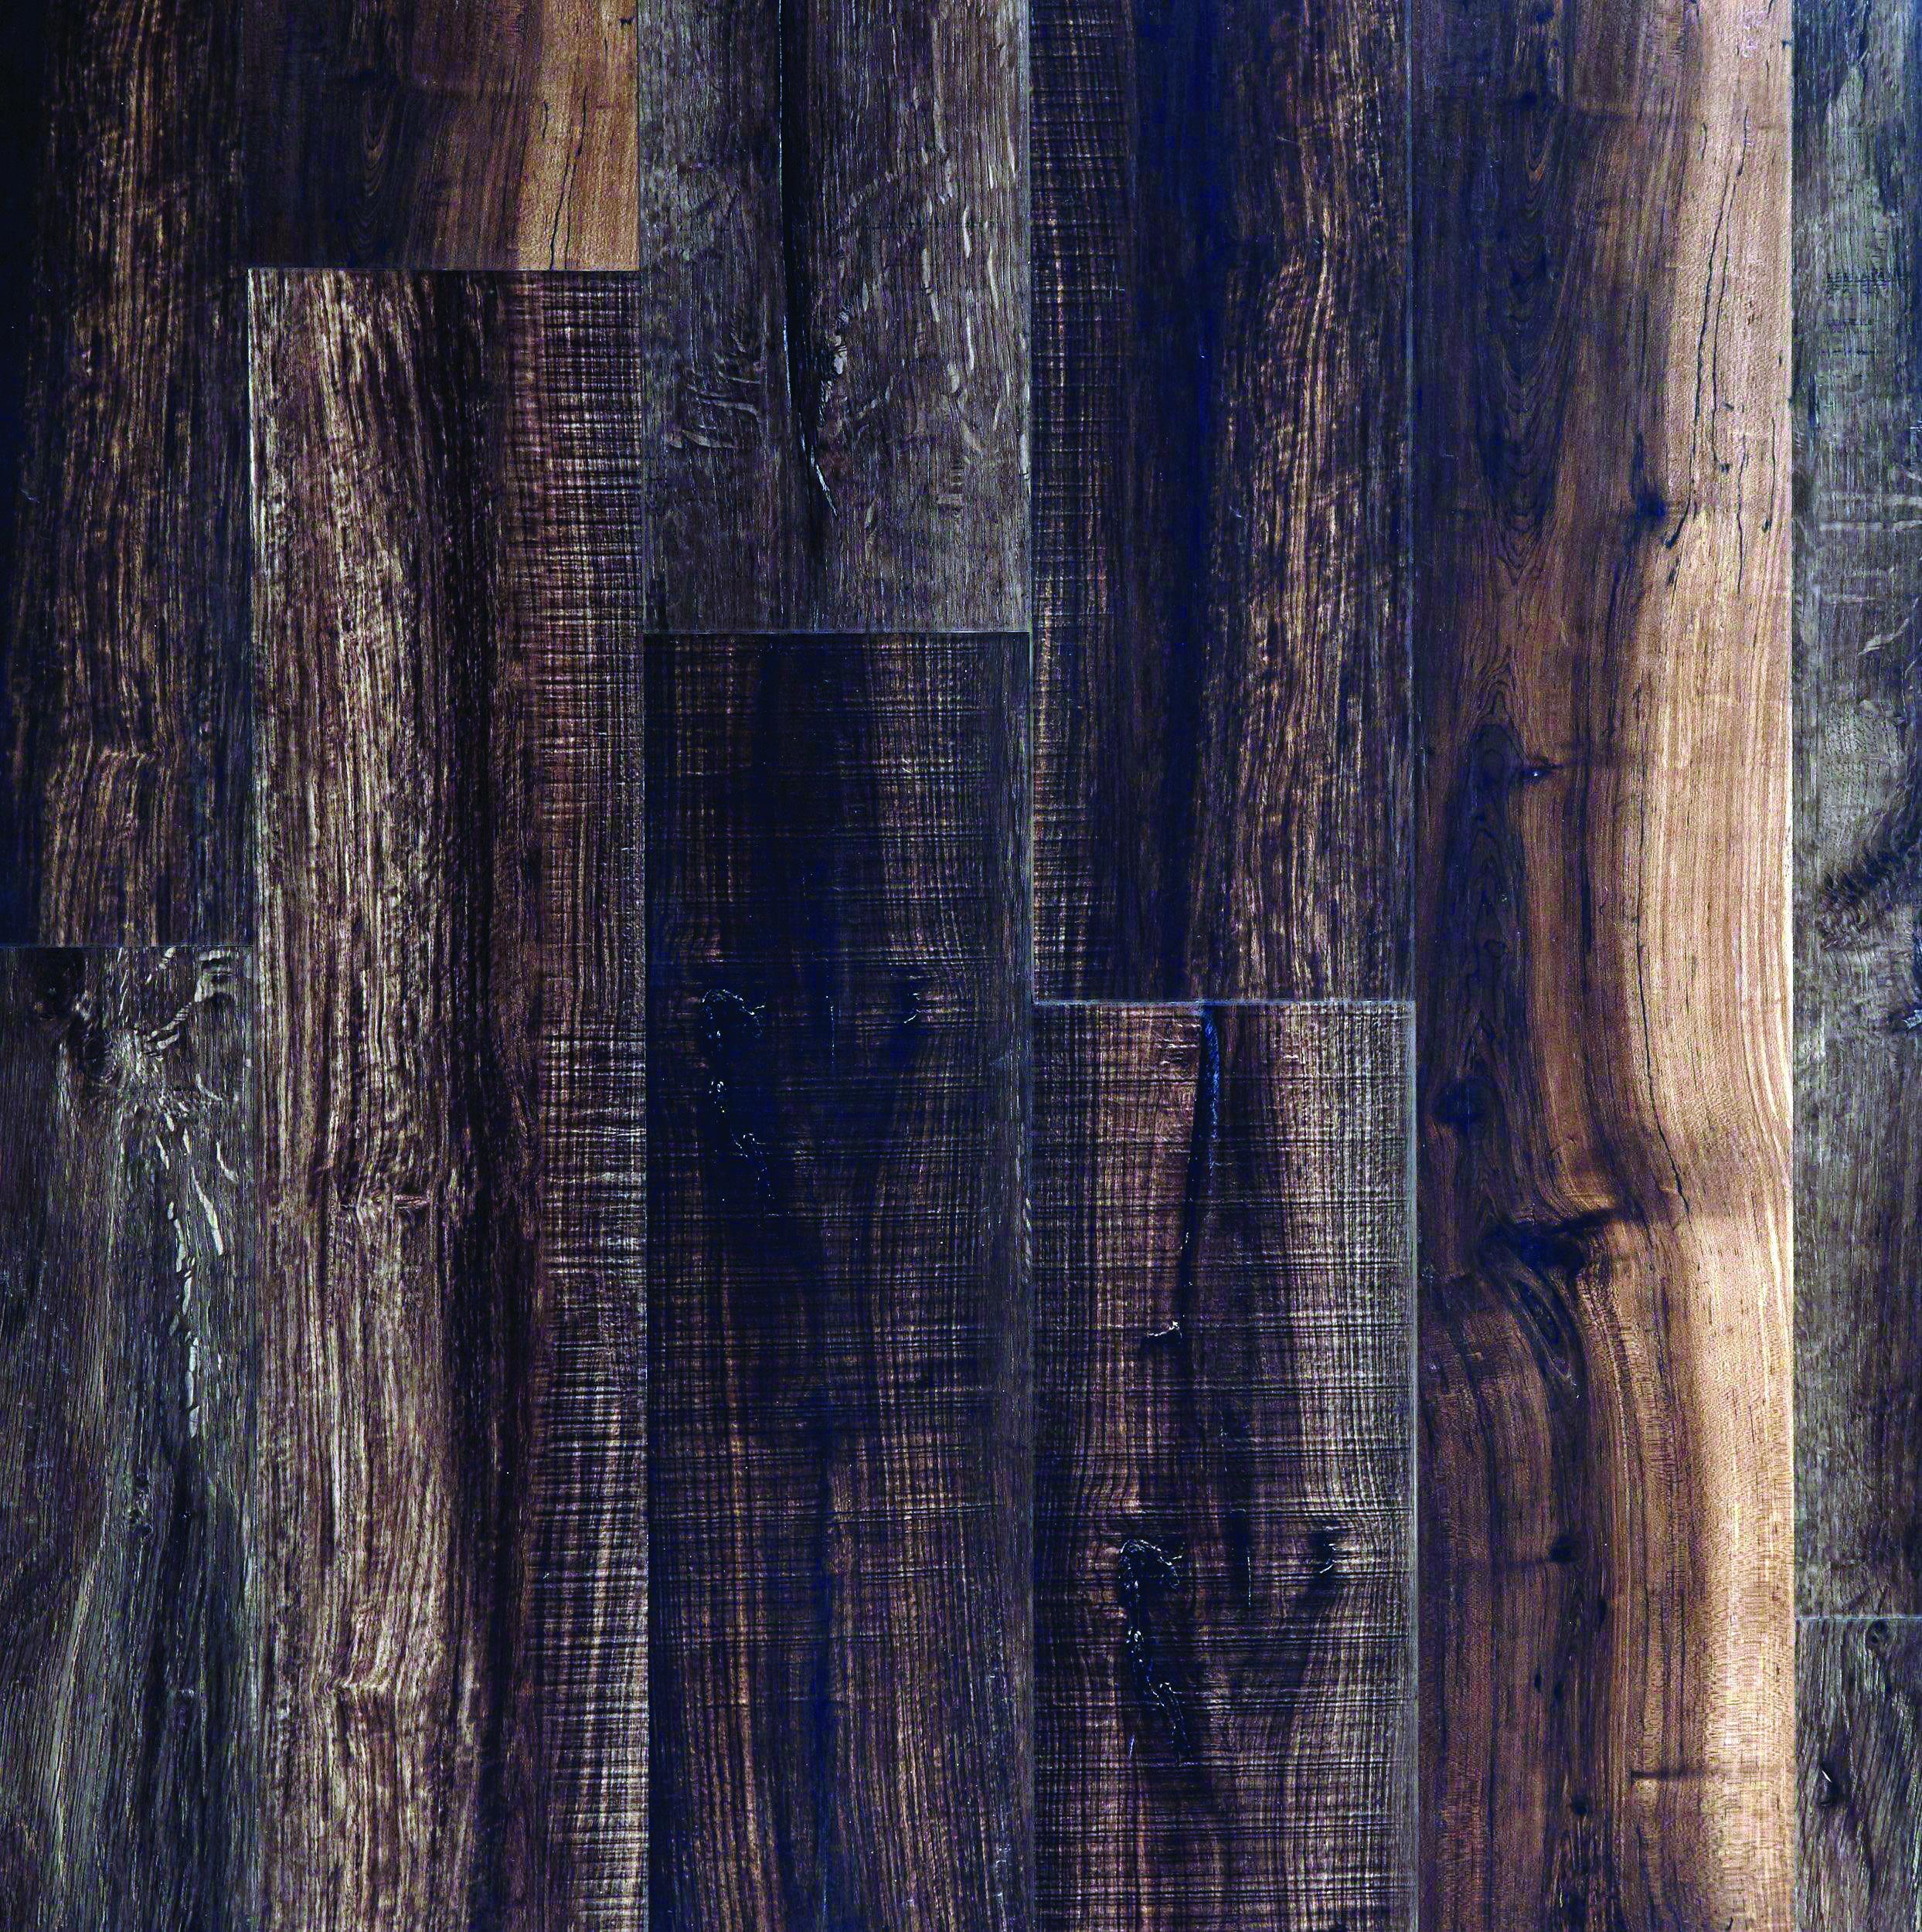 Absolute Best Luxury Vinyl Plank Floors For Your House Homes Tre Luxury Vinyl Plank Luxury Vinyl Plank Flooring Luxury Vinyl